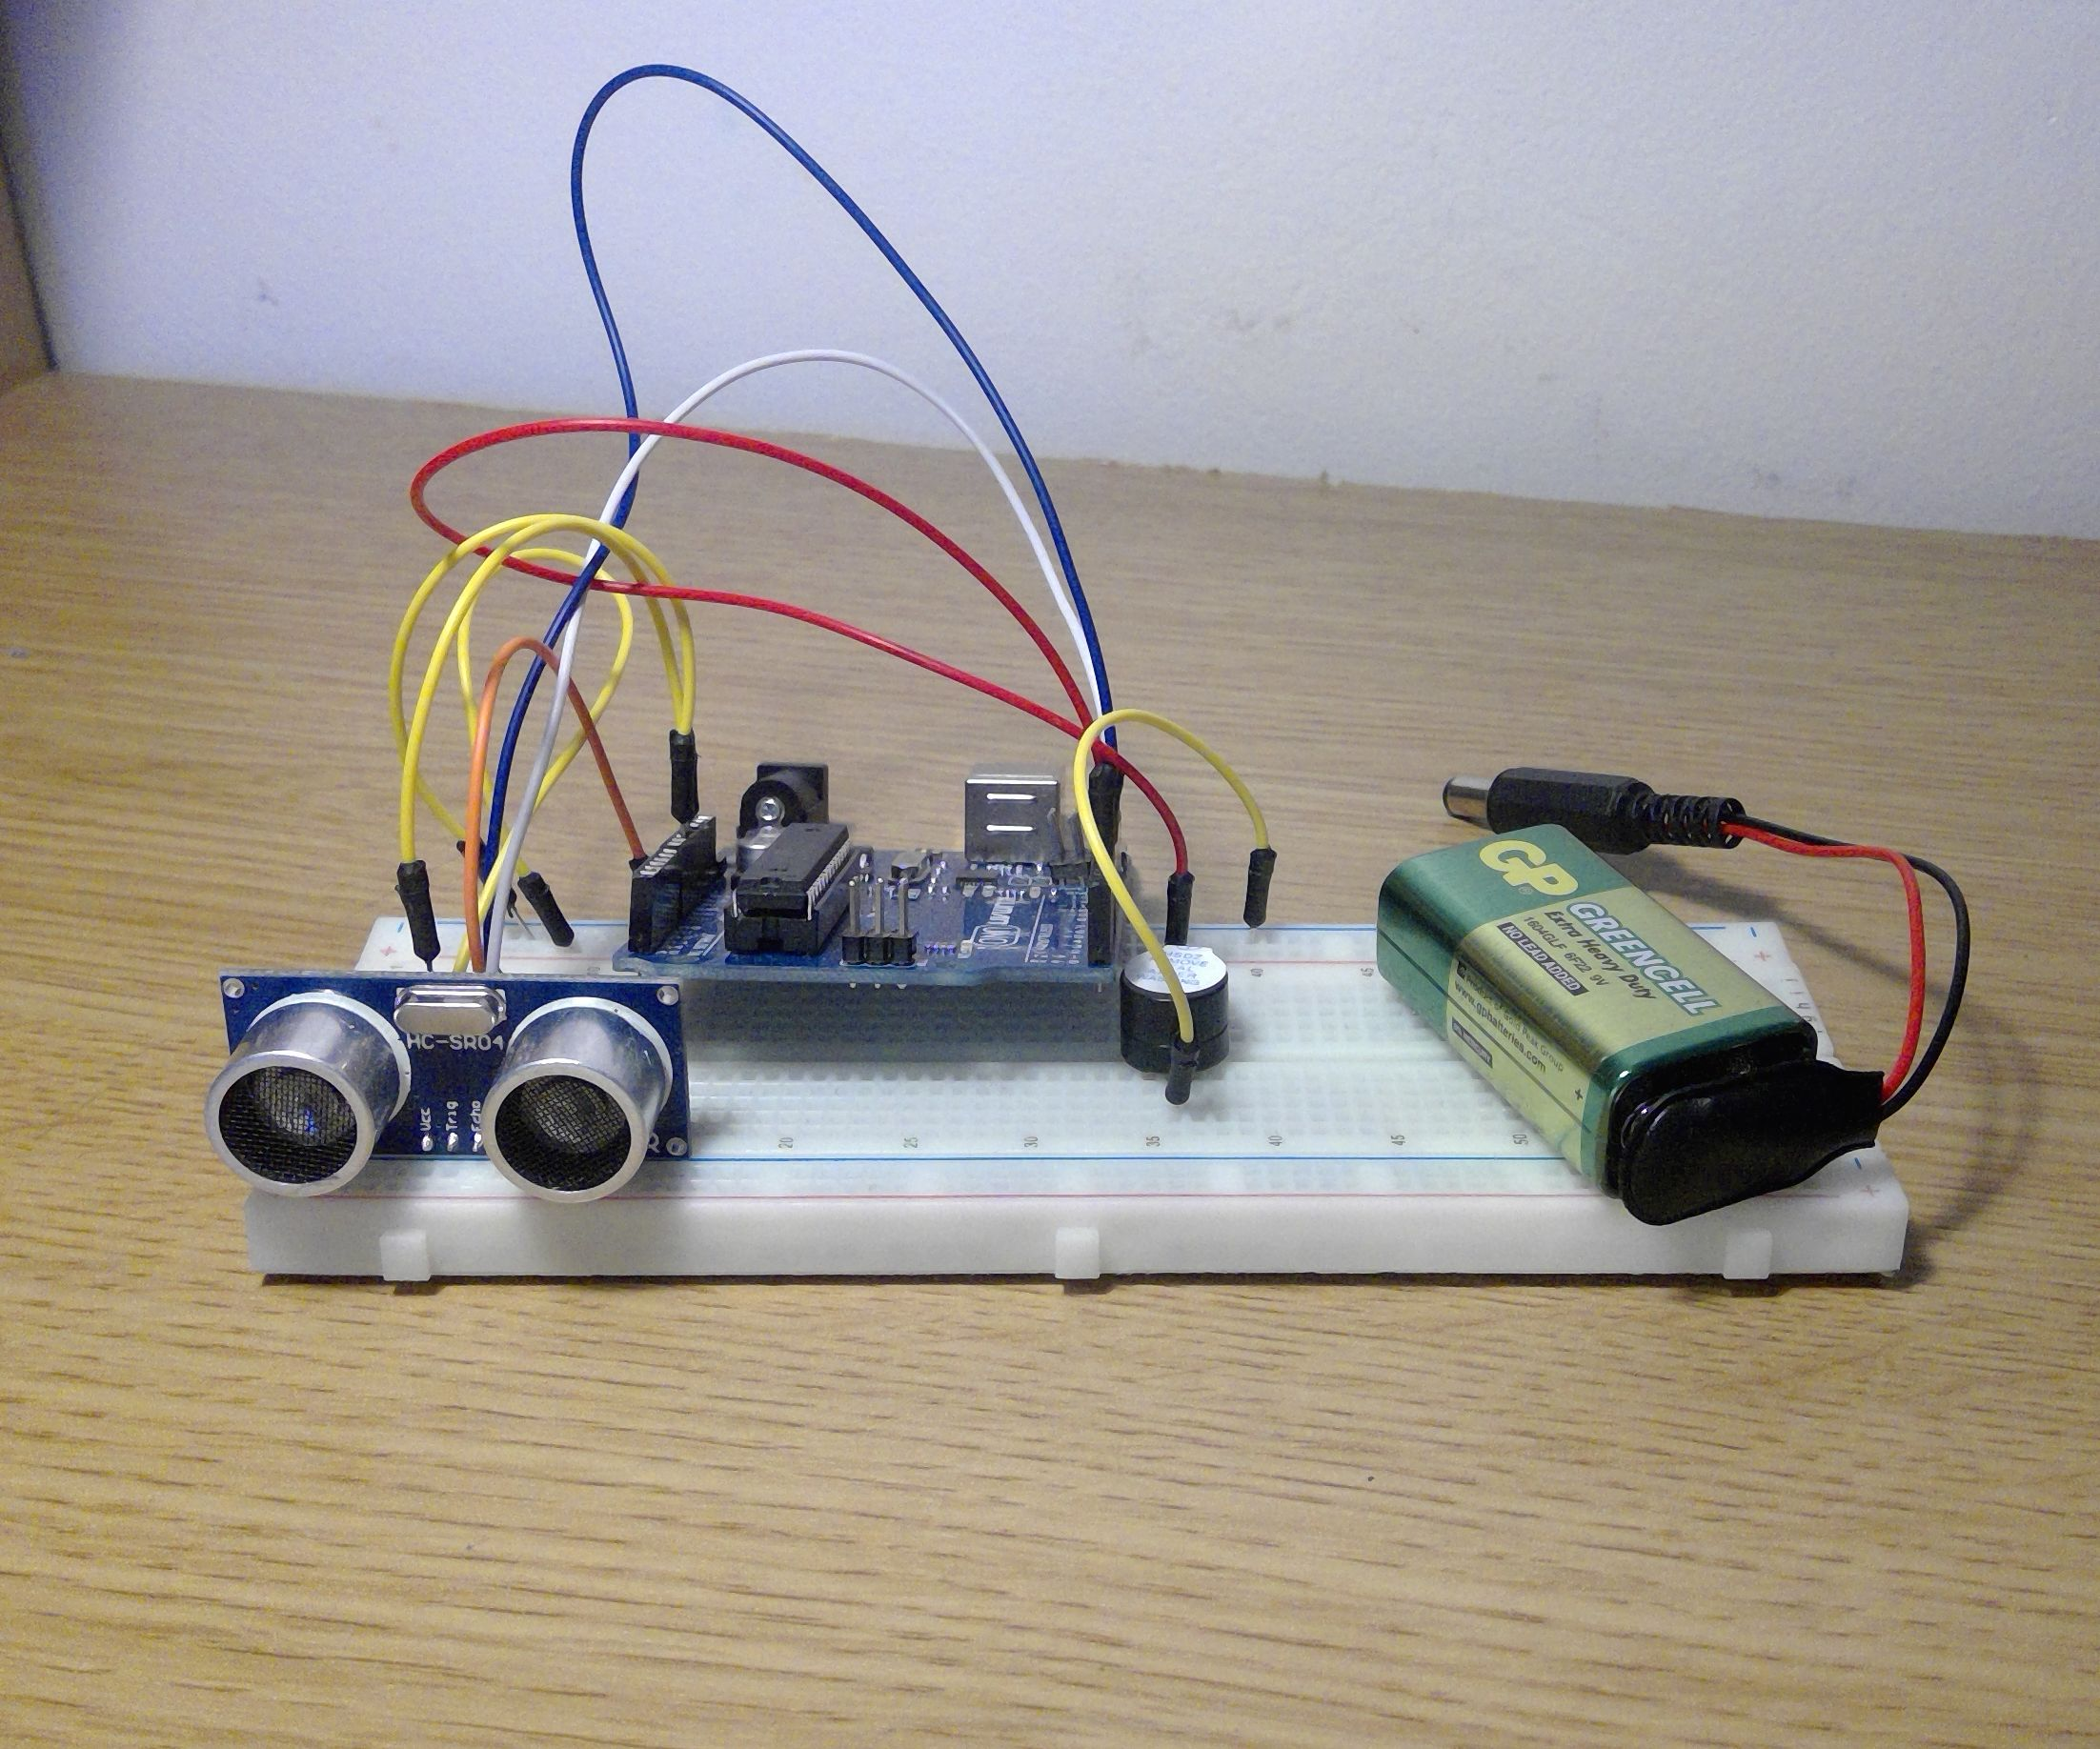 sound sensor search results how to make an arduino ultra sound car parking sensor